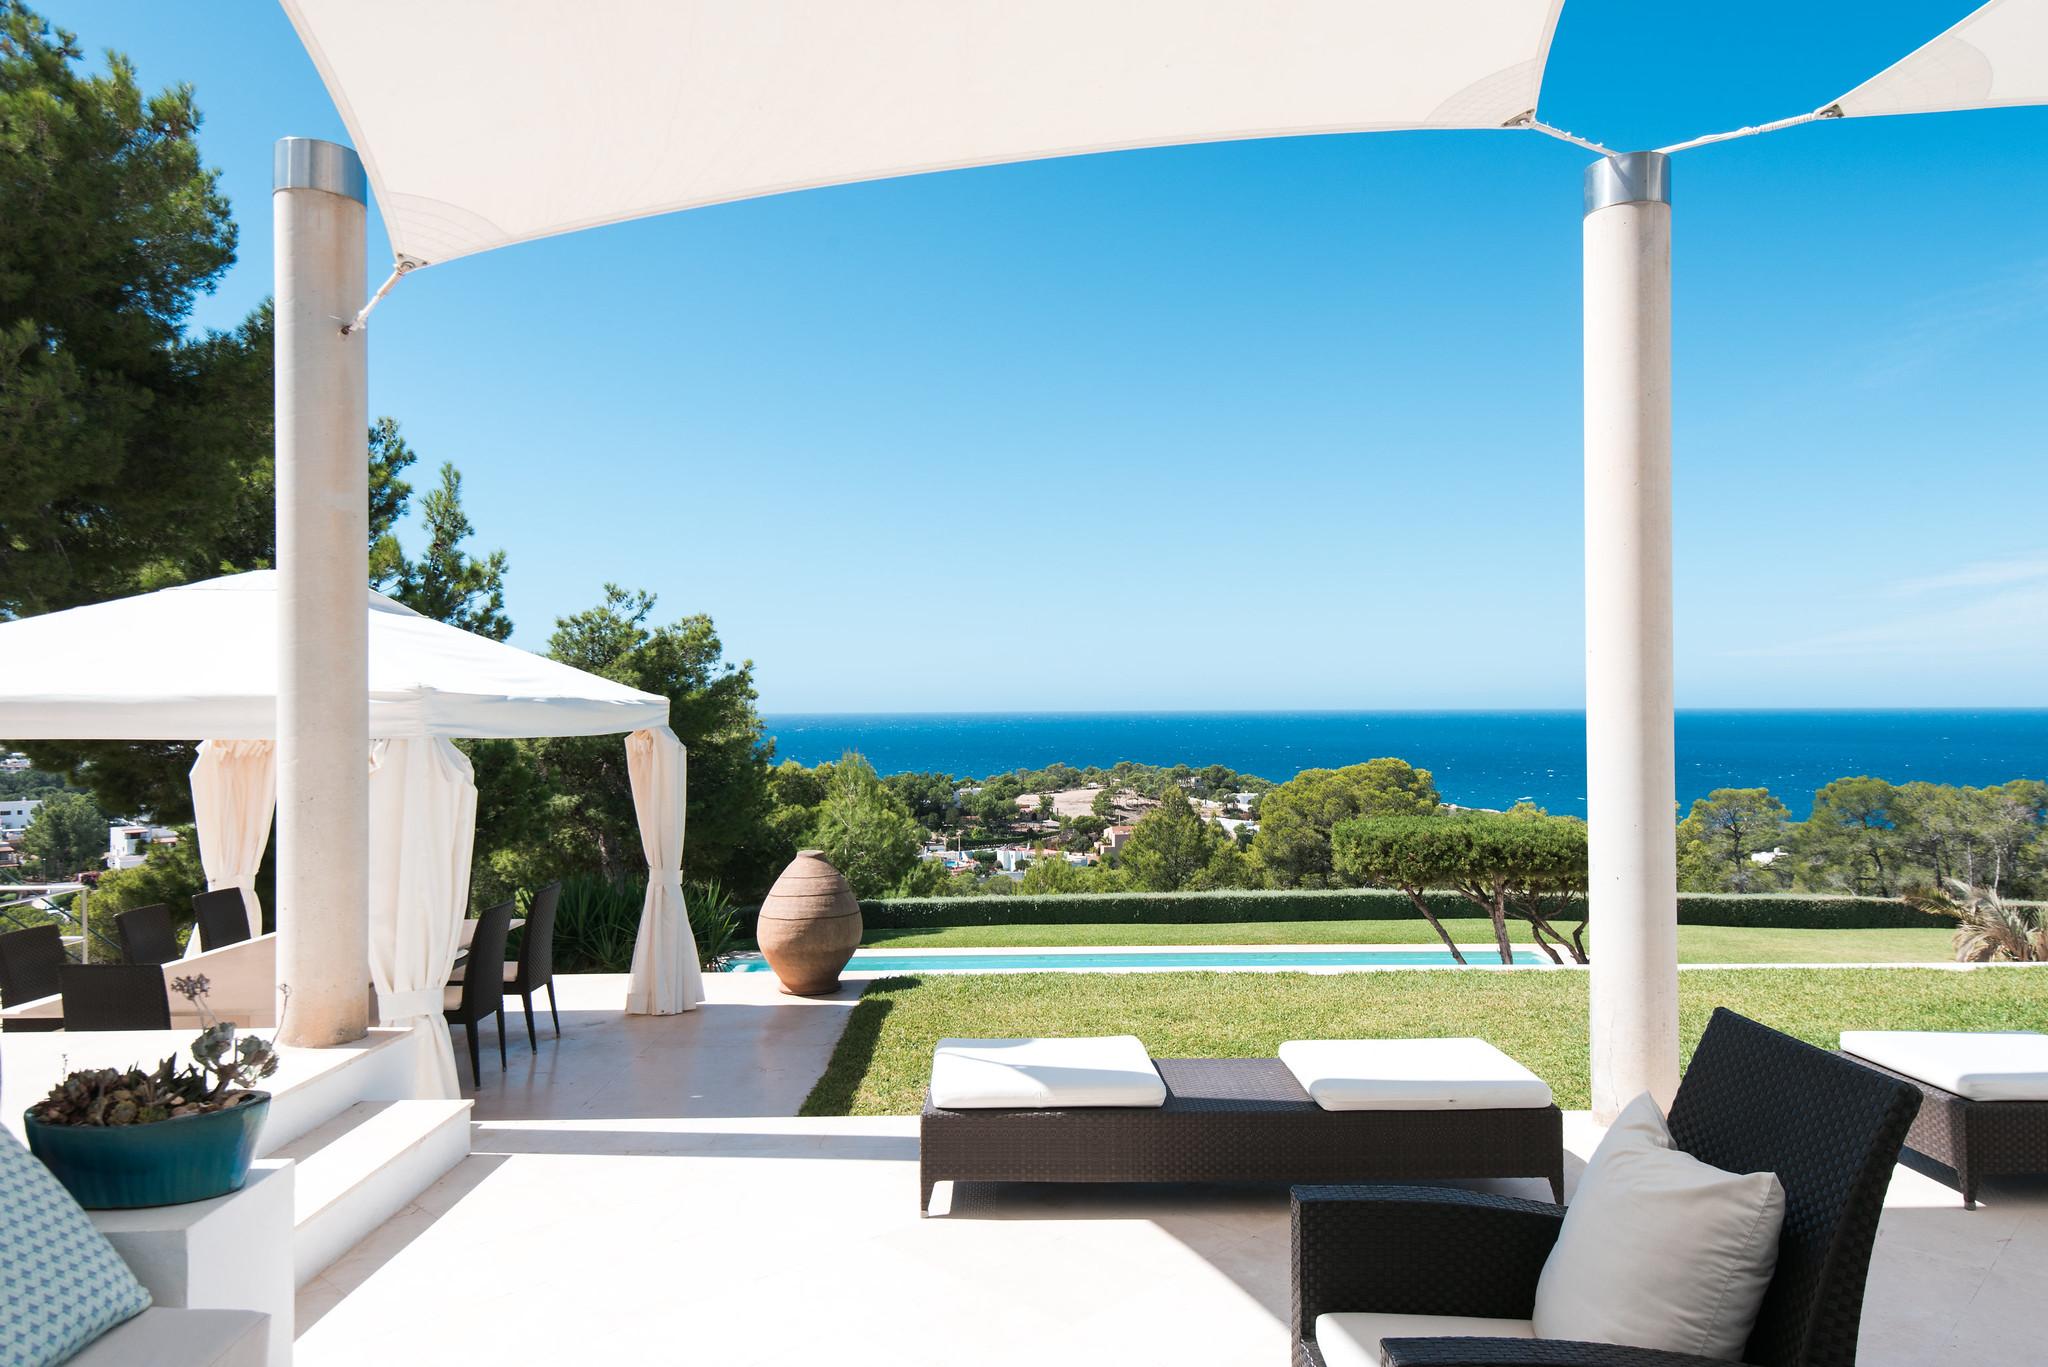 https://www.white-ibiza.com/wp-content/uploads/2020/05/white-ibiza-villas-can-ava-view1.jpg